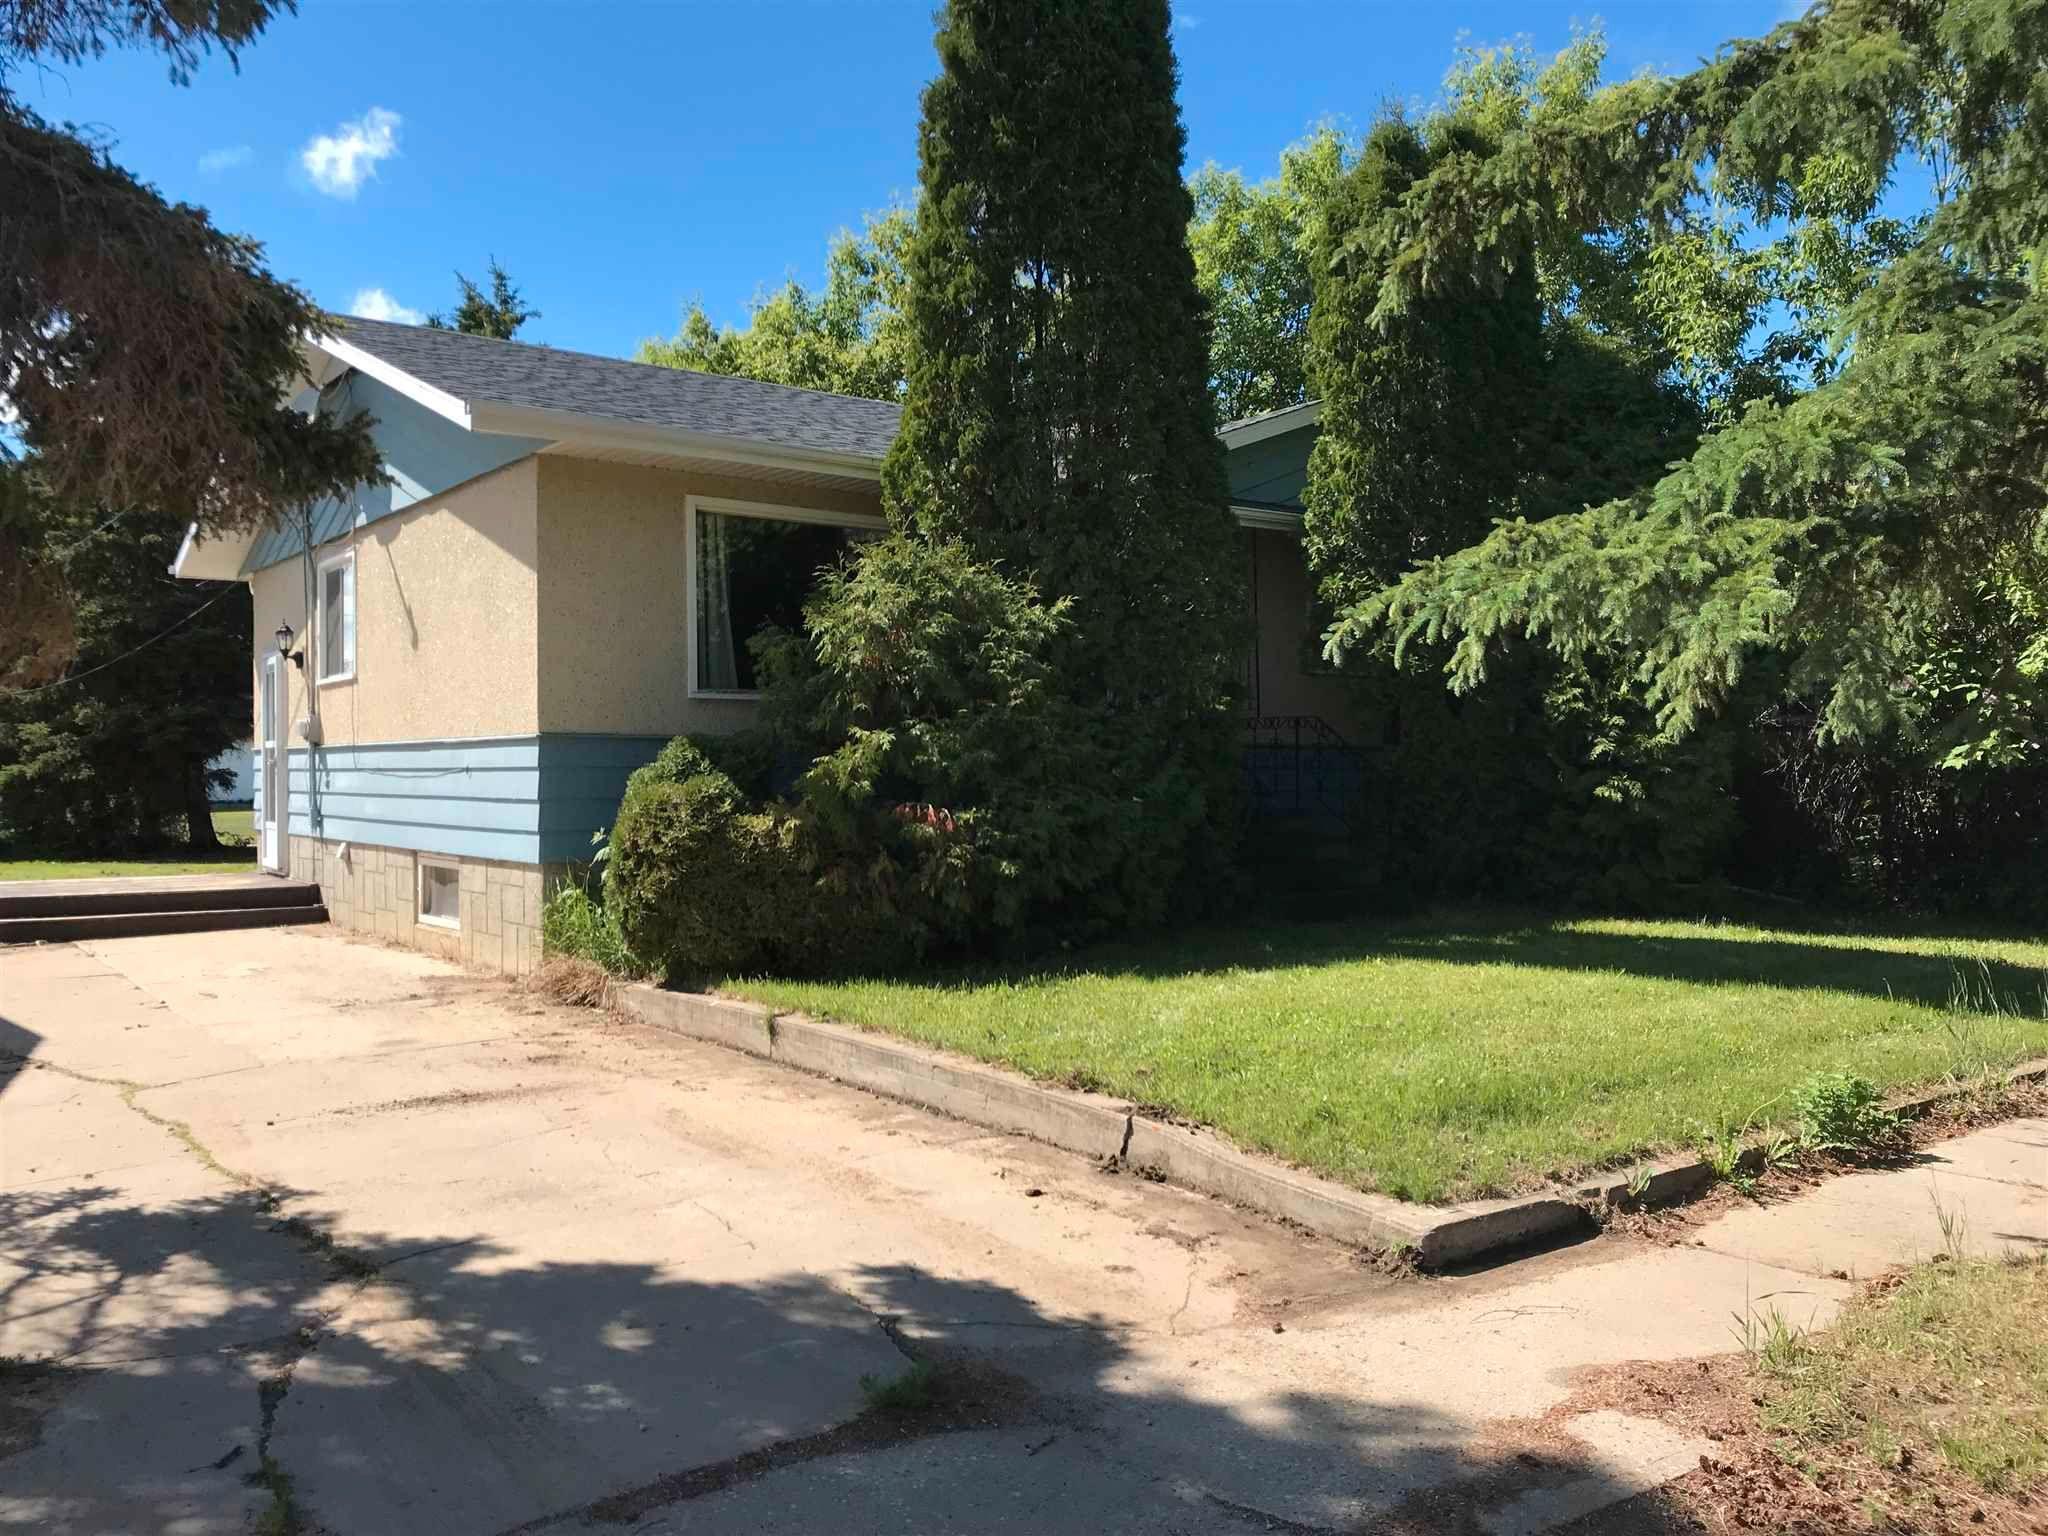 Main Photo: 218 6 Street: Thorhild House for sale : MLS®# E4250735